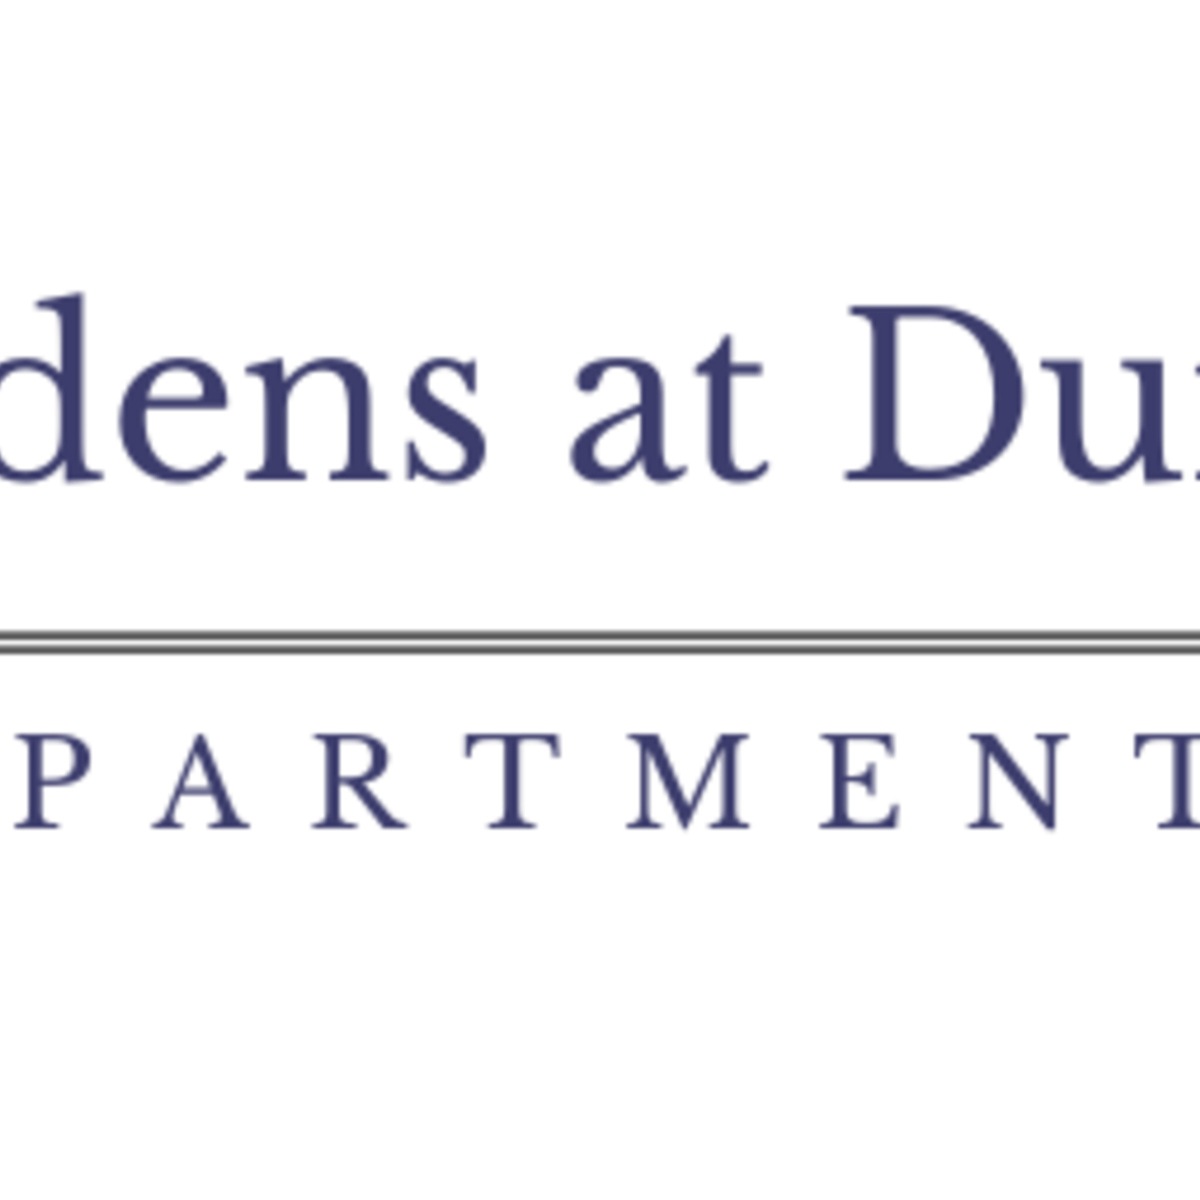 Craigslist Nh Apartments: Contact Us THE GARDENS AT DUNCAN APARTMENTS